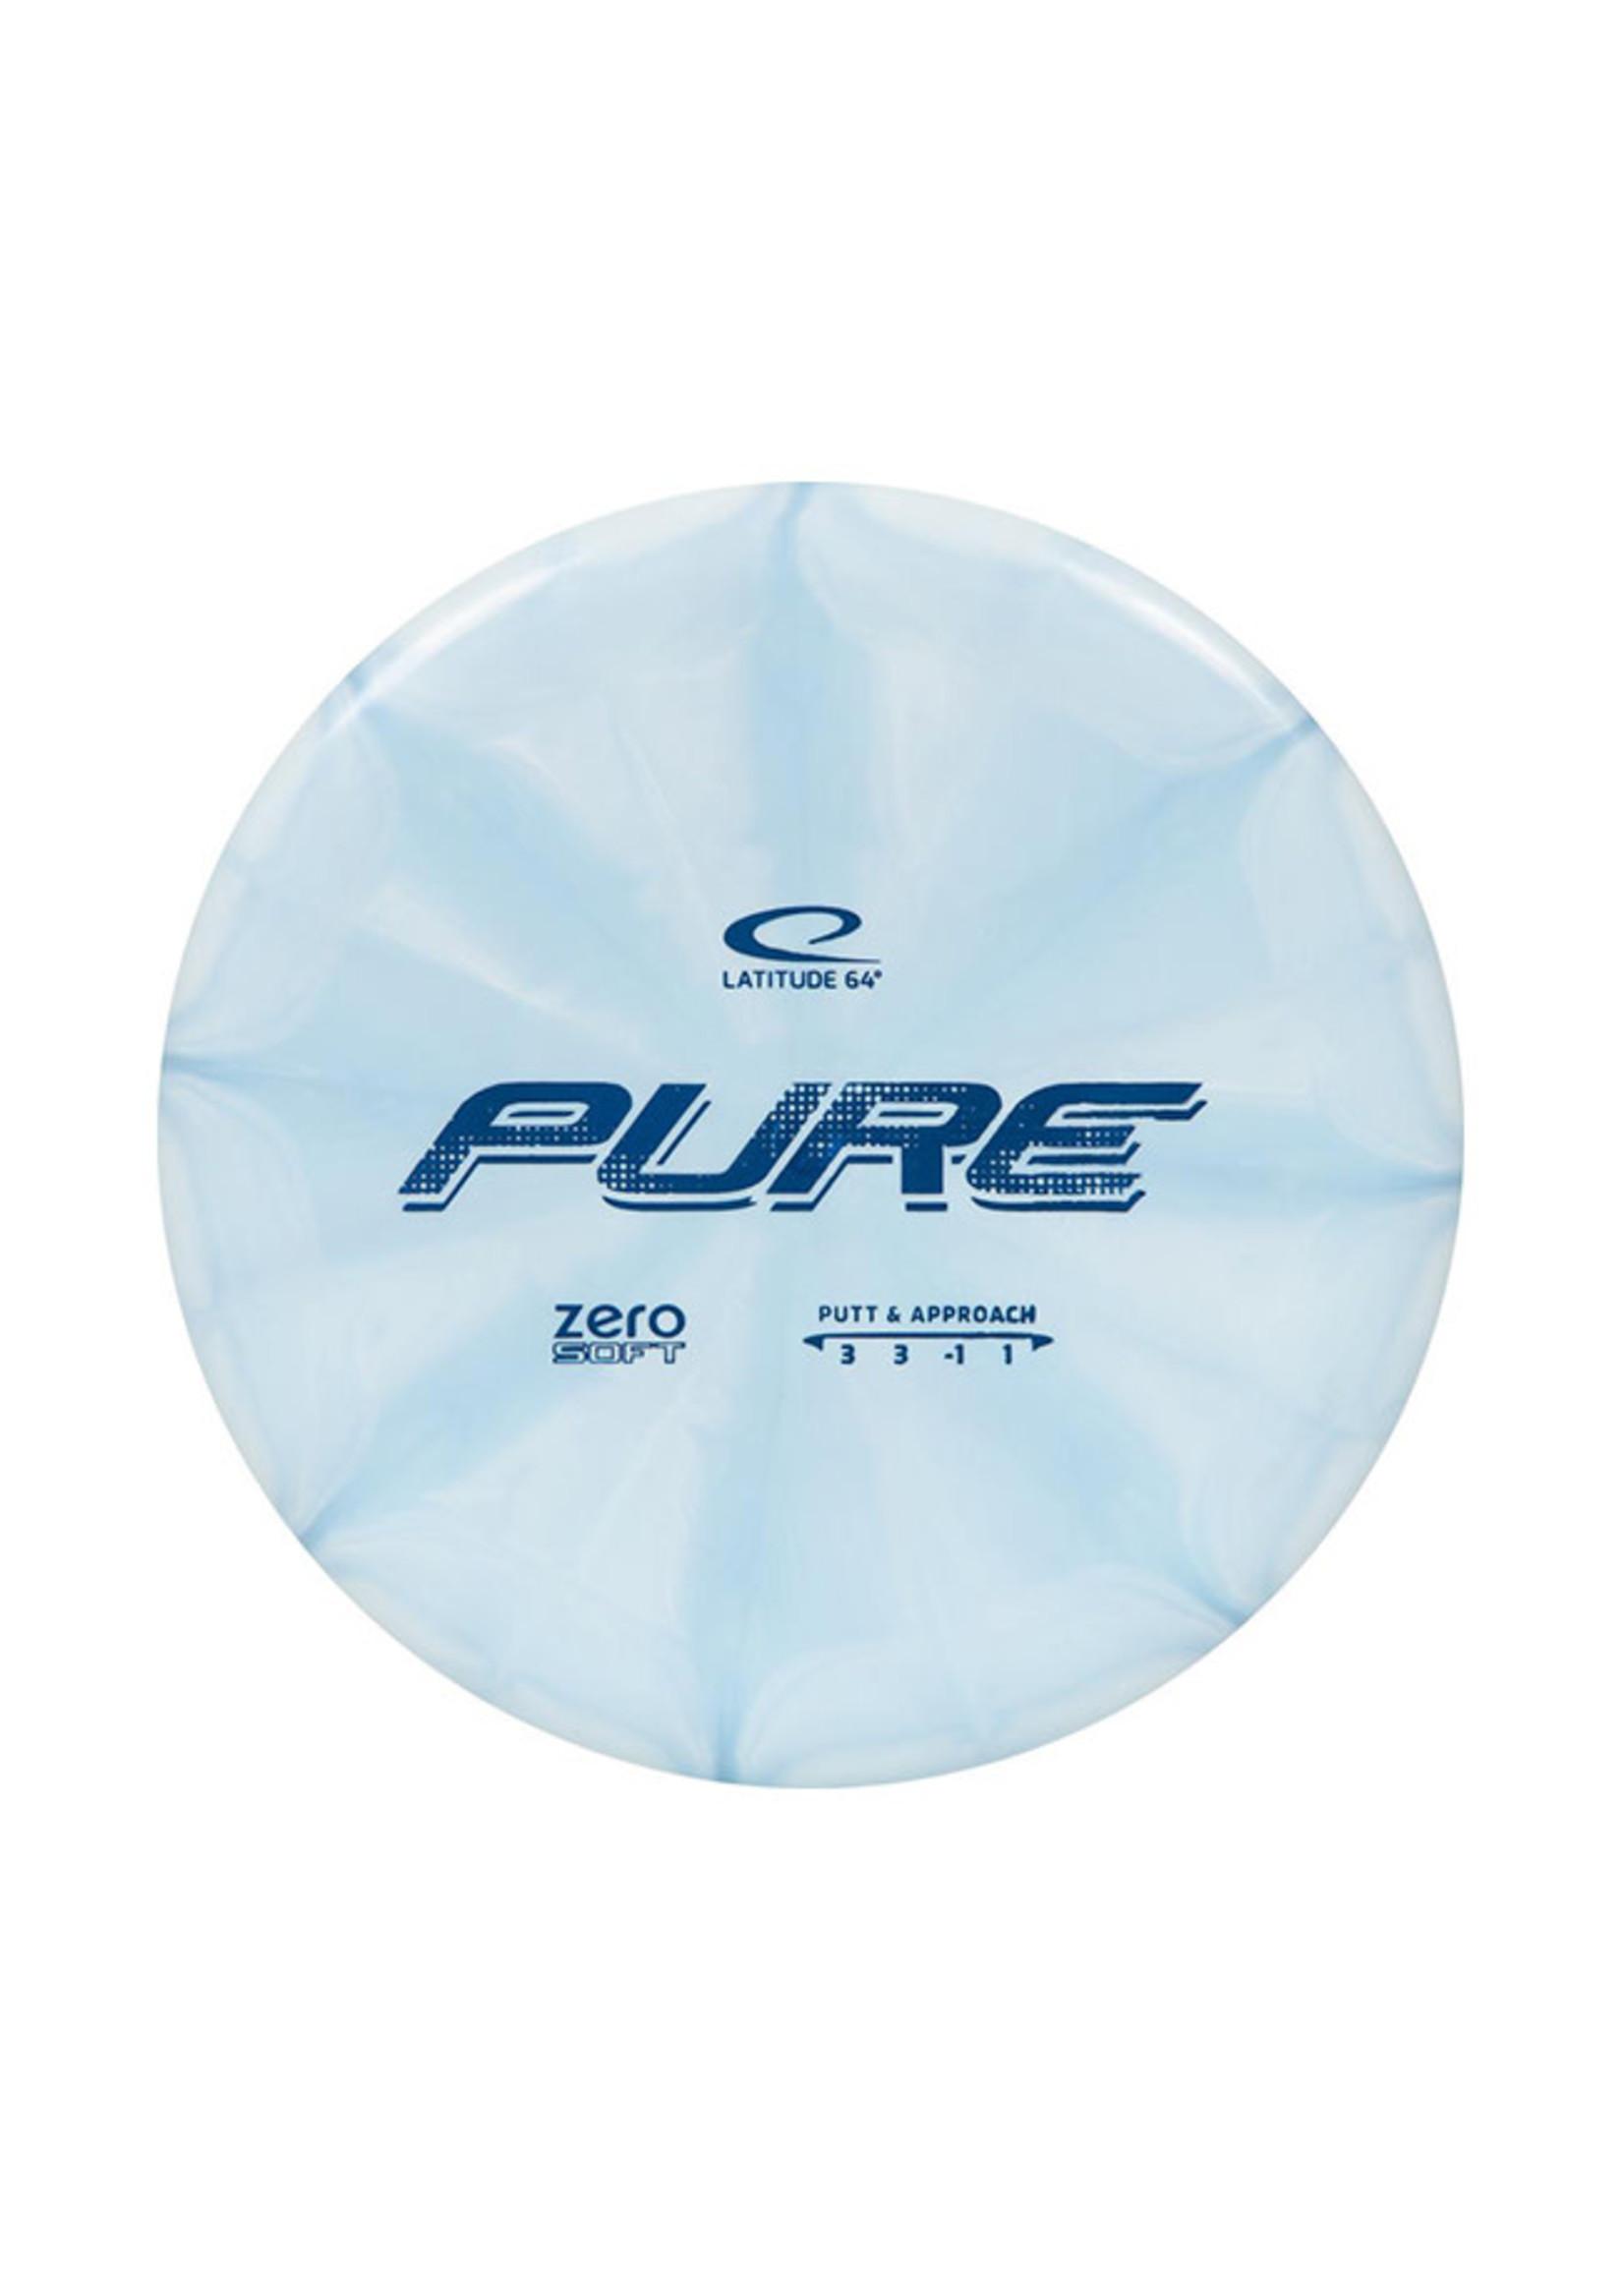 Latitude 64 Latitude 64 Pure Putt & Approach Disc